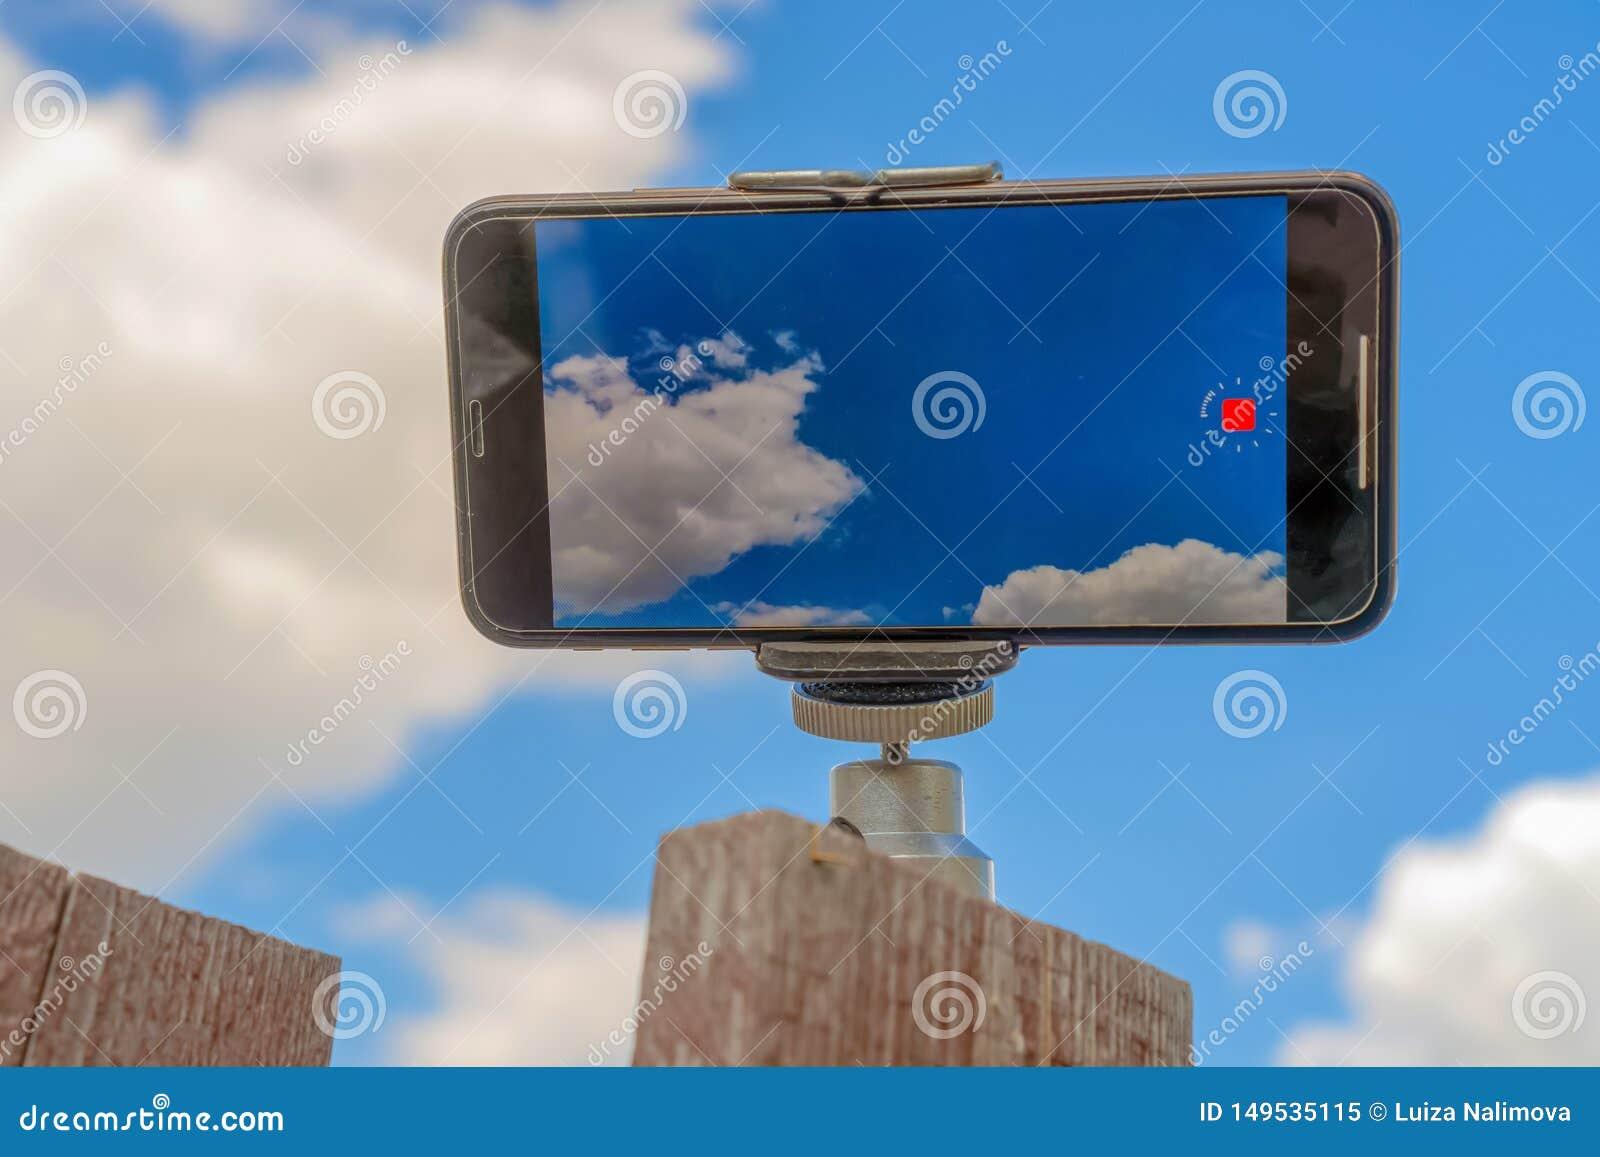 Россия, Казань - 10-ое мая 2019: iPhone XS снимает видео- промежуток времени Фото неба на iPhone XS